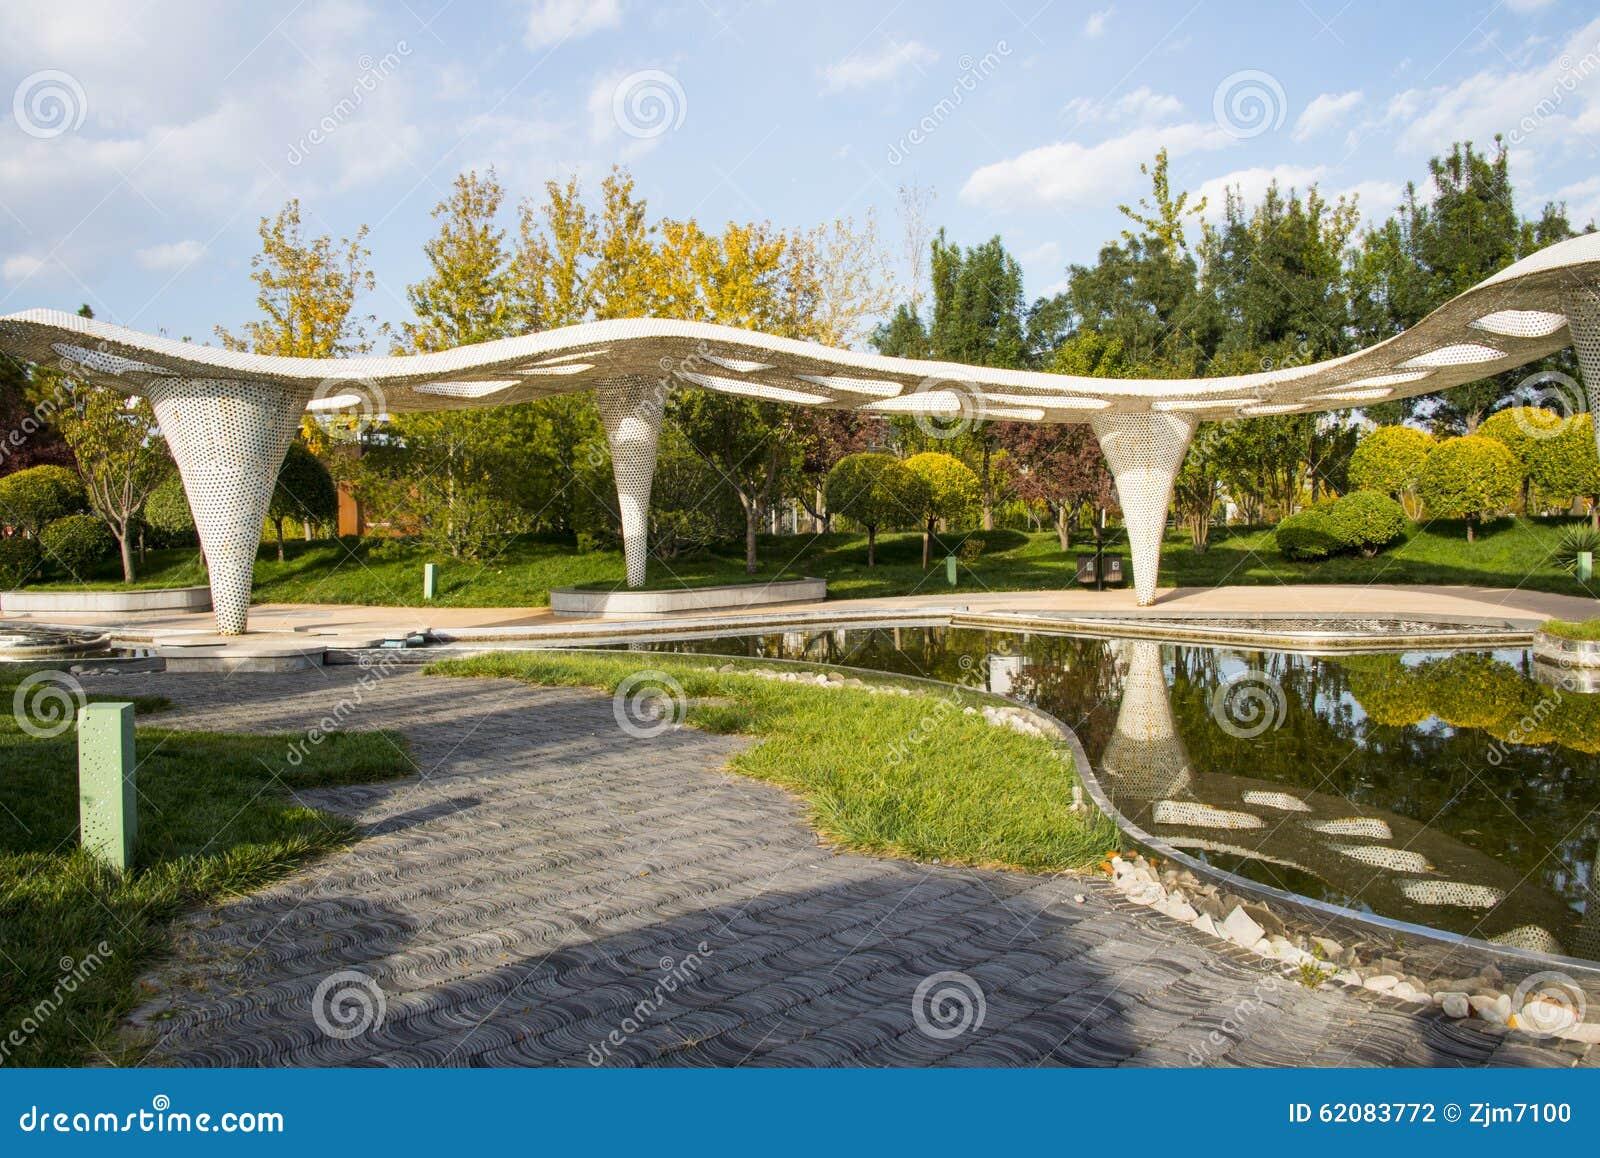 Asia chinese beijing garden expo the garden architecture for Garden architecture